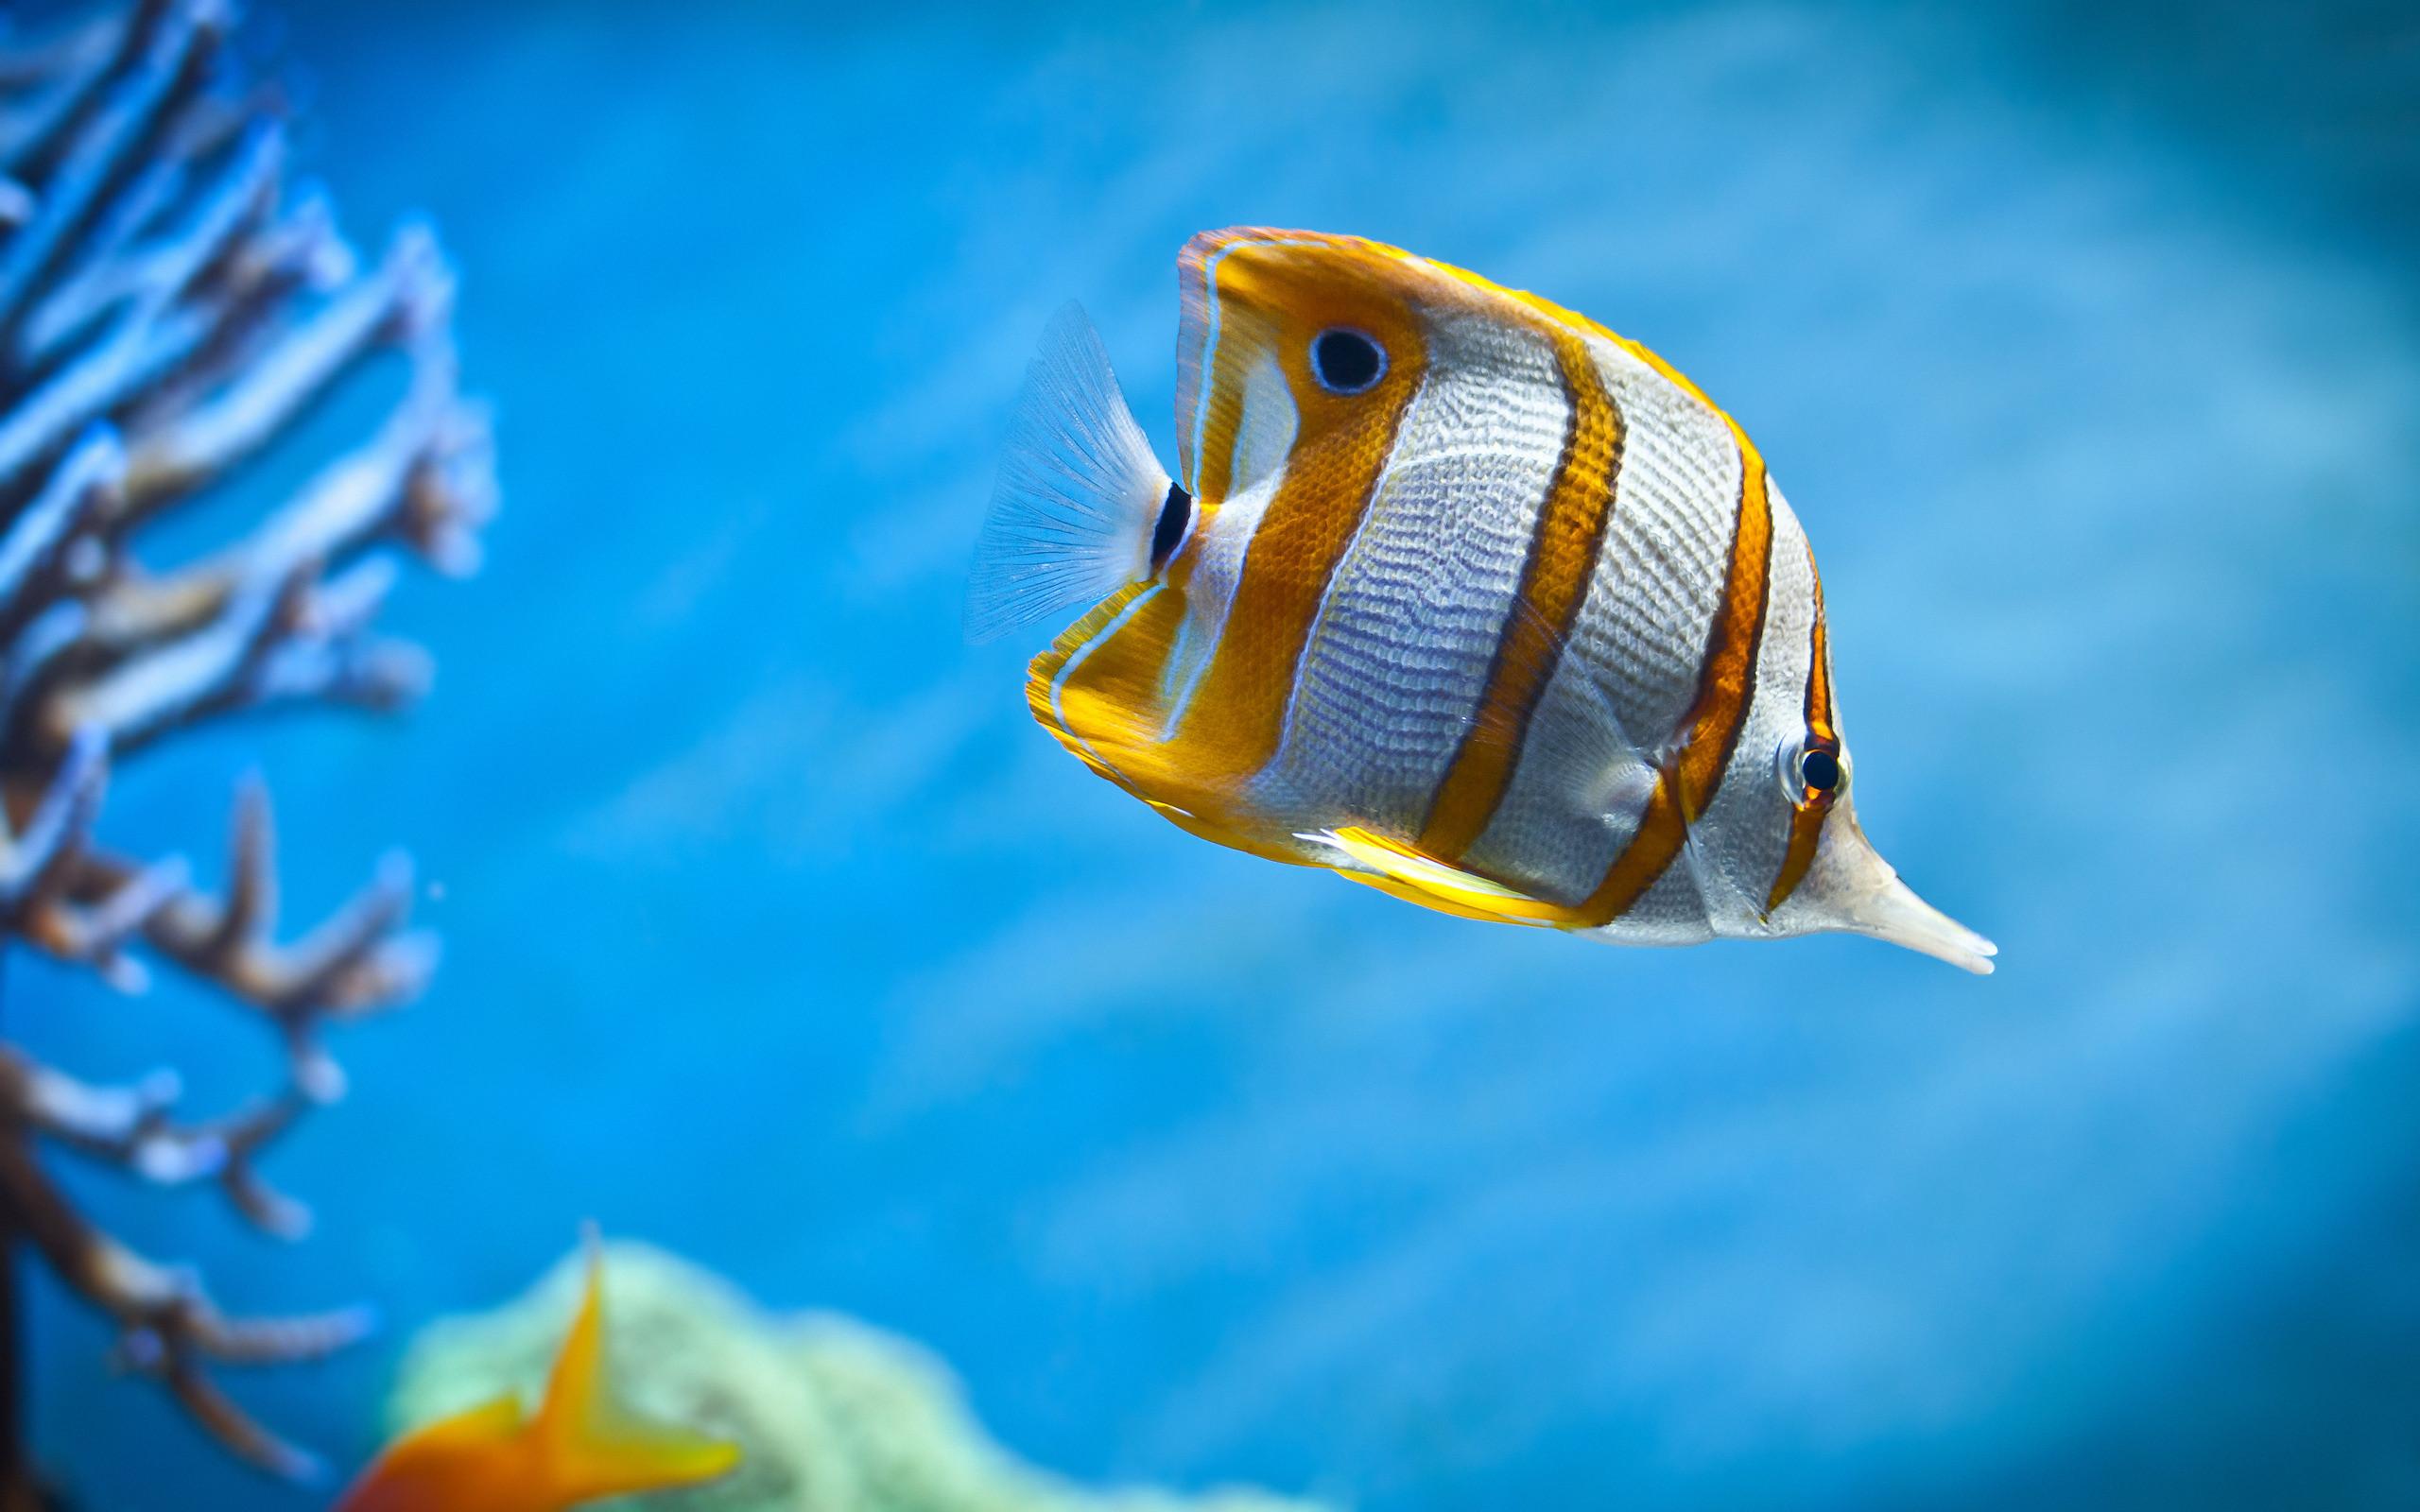 Moon jellyfish 4K Ultra HD Wallpaper | Aquarium Fish Wallpapers Pictures  Photos Images